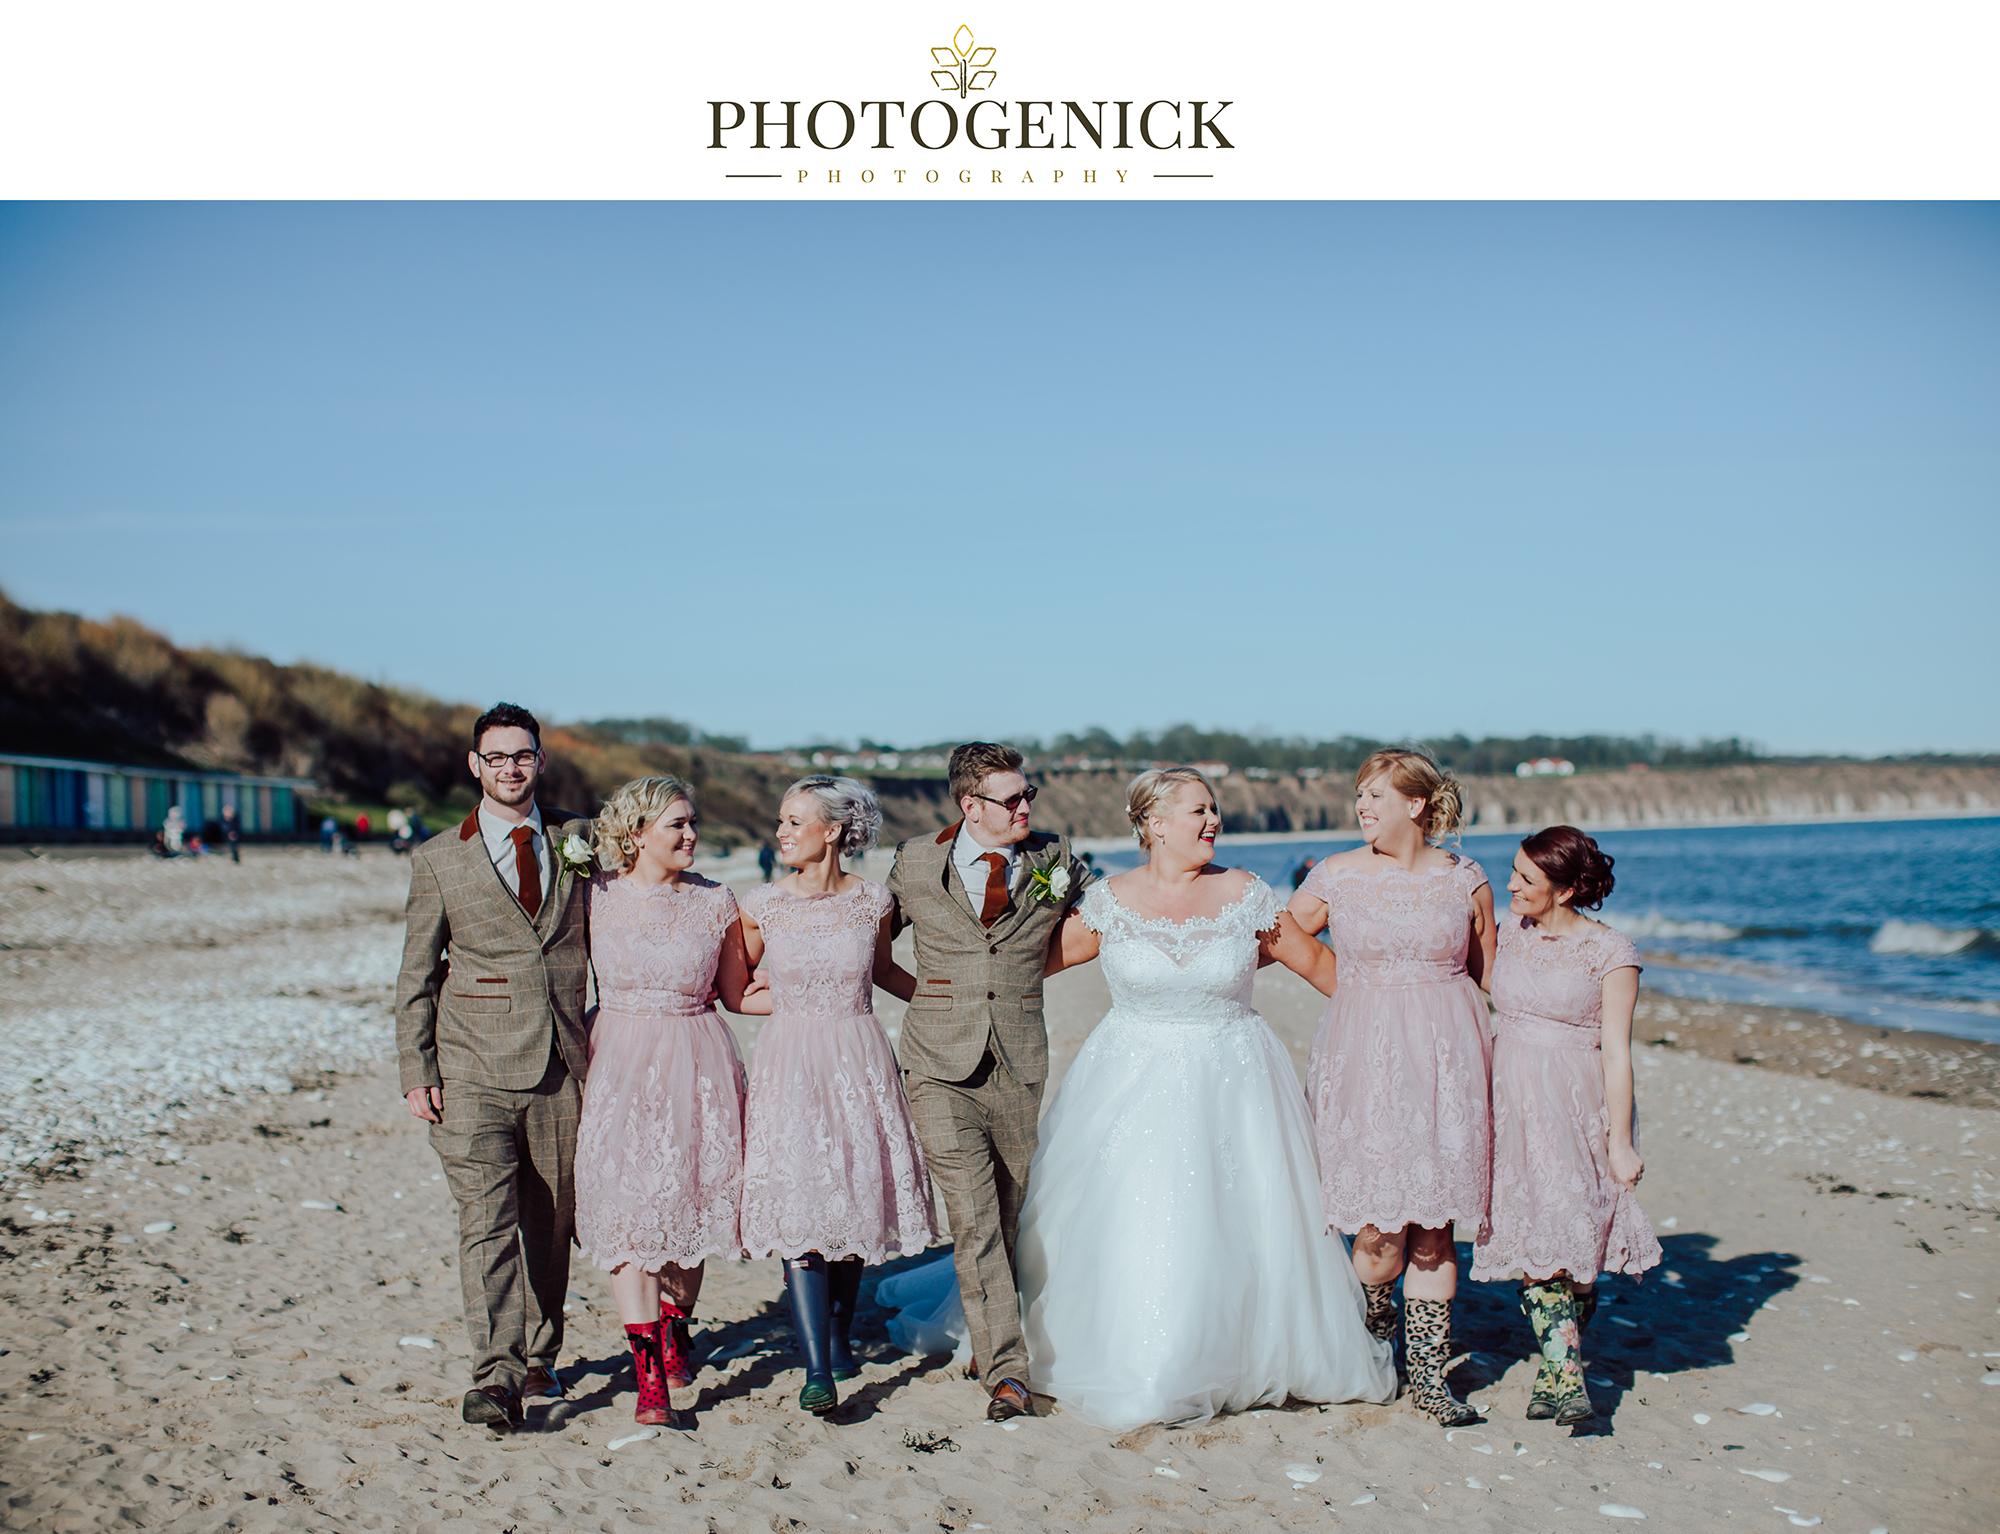 wedding photographers rotherham